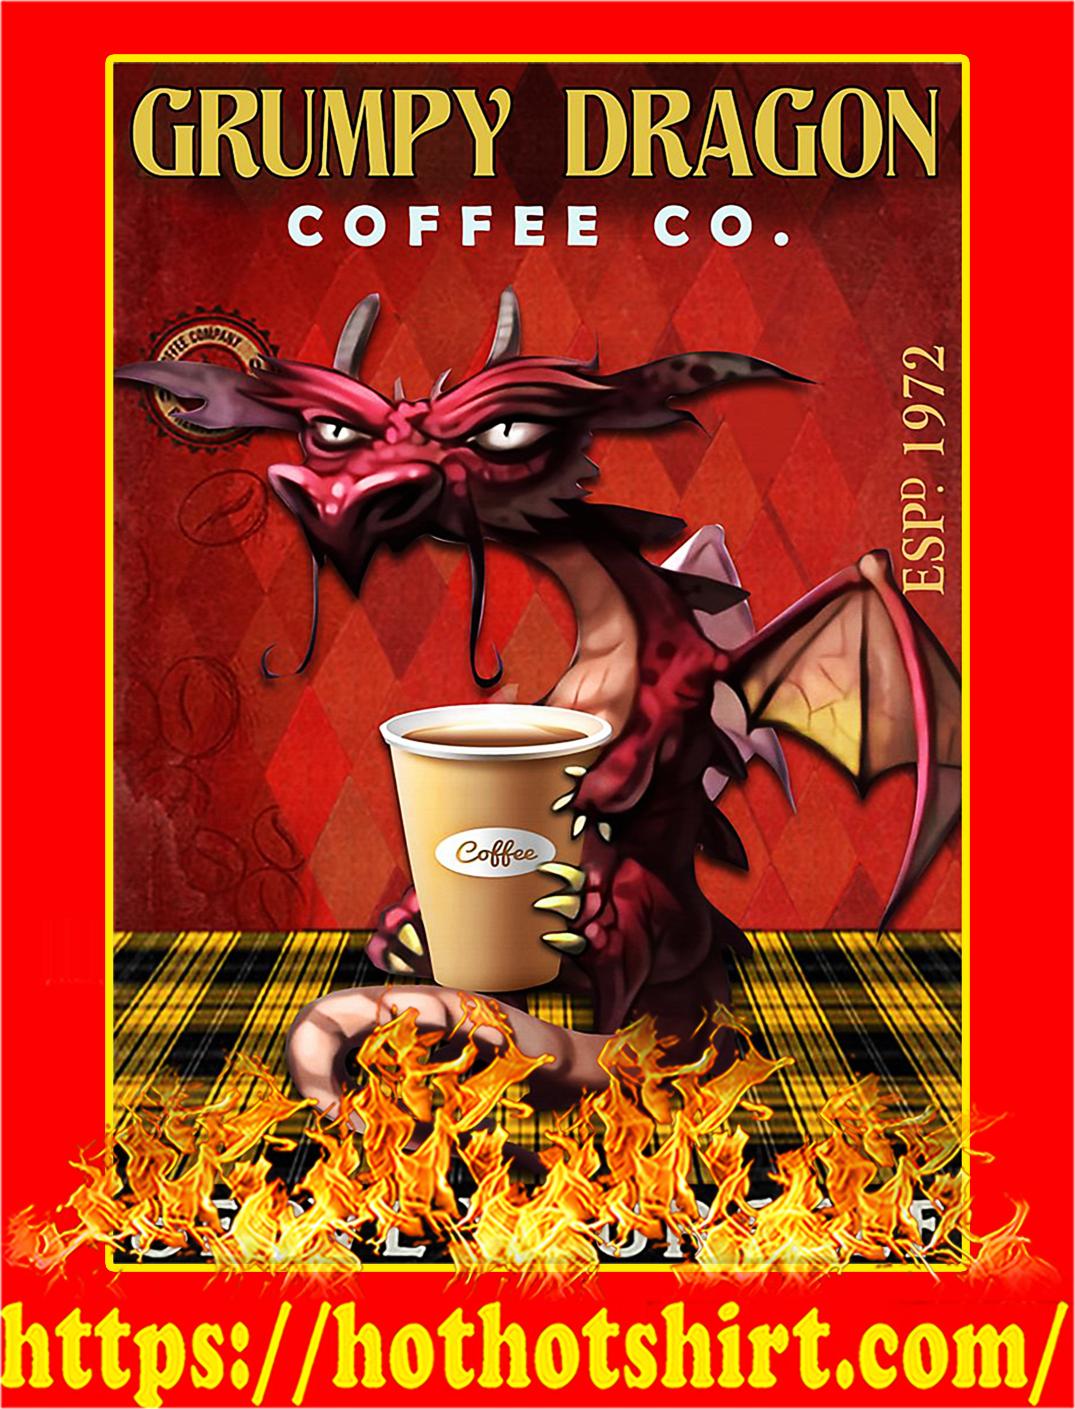 Grumpy Dragon Coffee Co Poster - A2